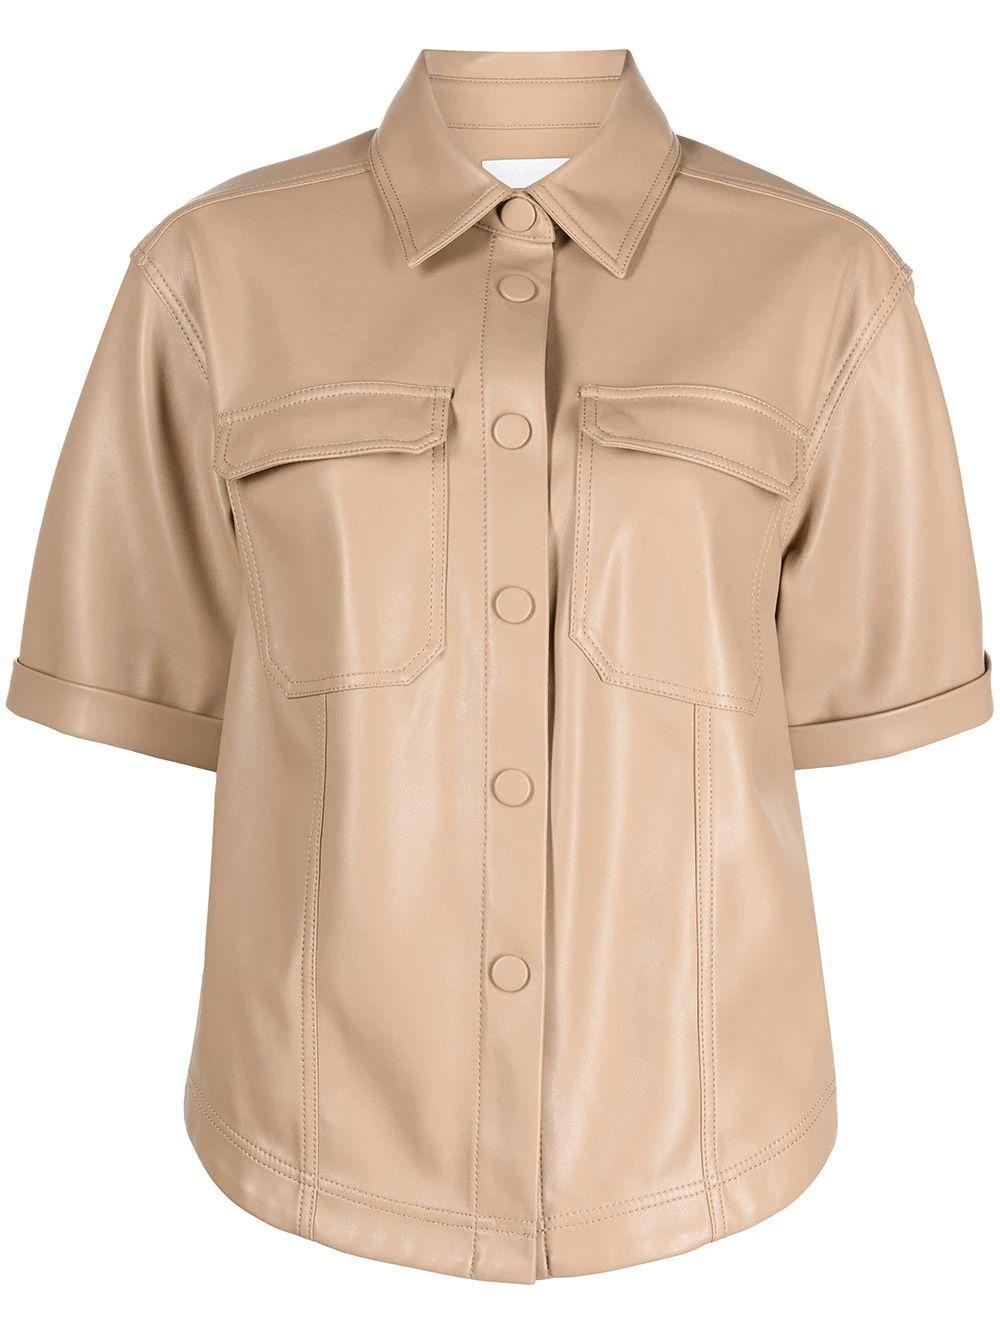 Joselin Vegan Leather Shirt Item # 421-2146-V